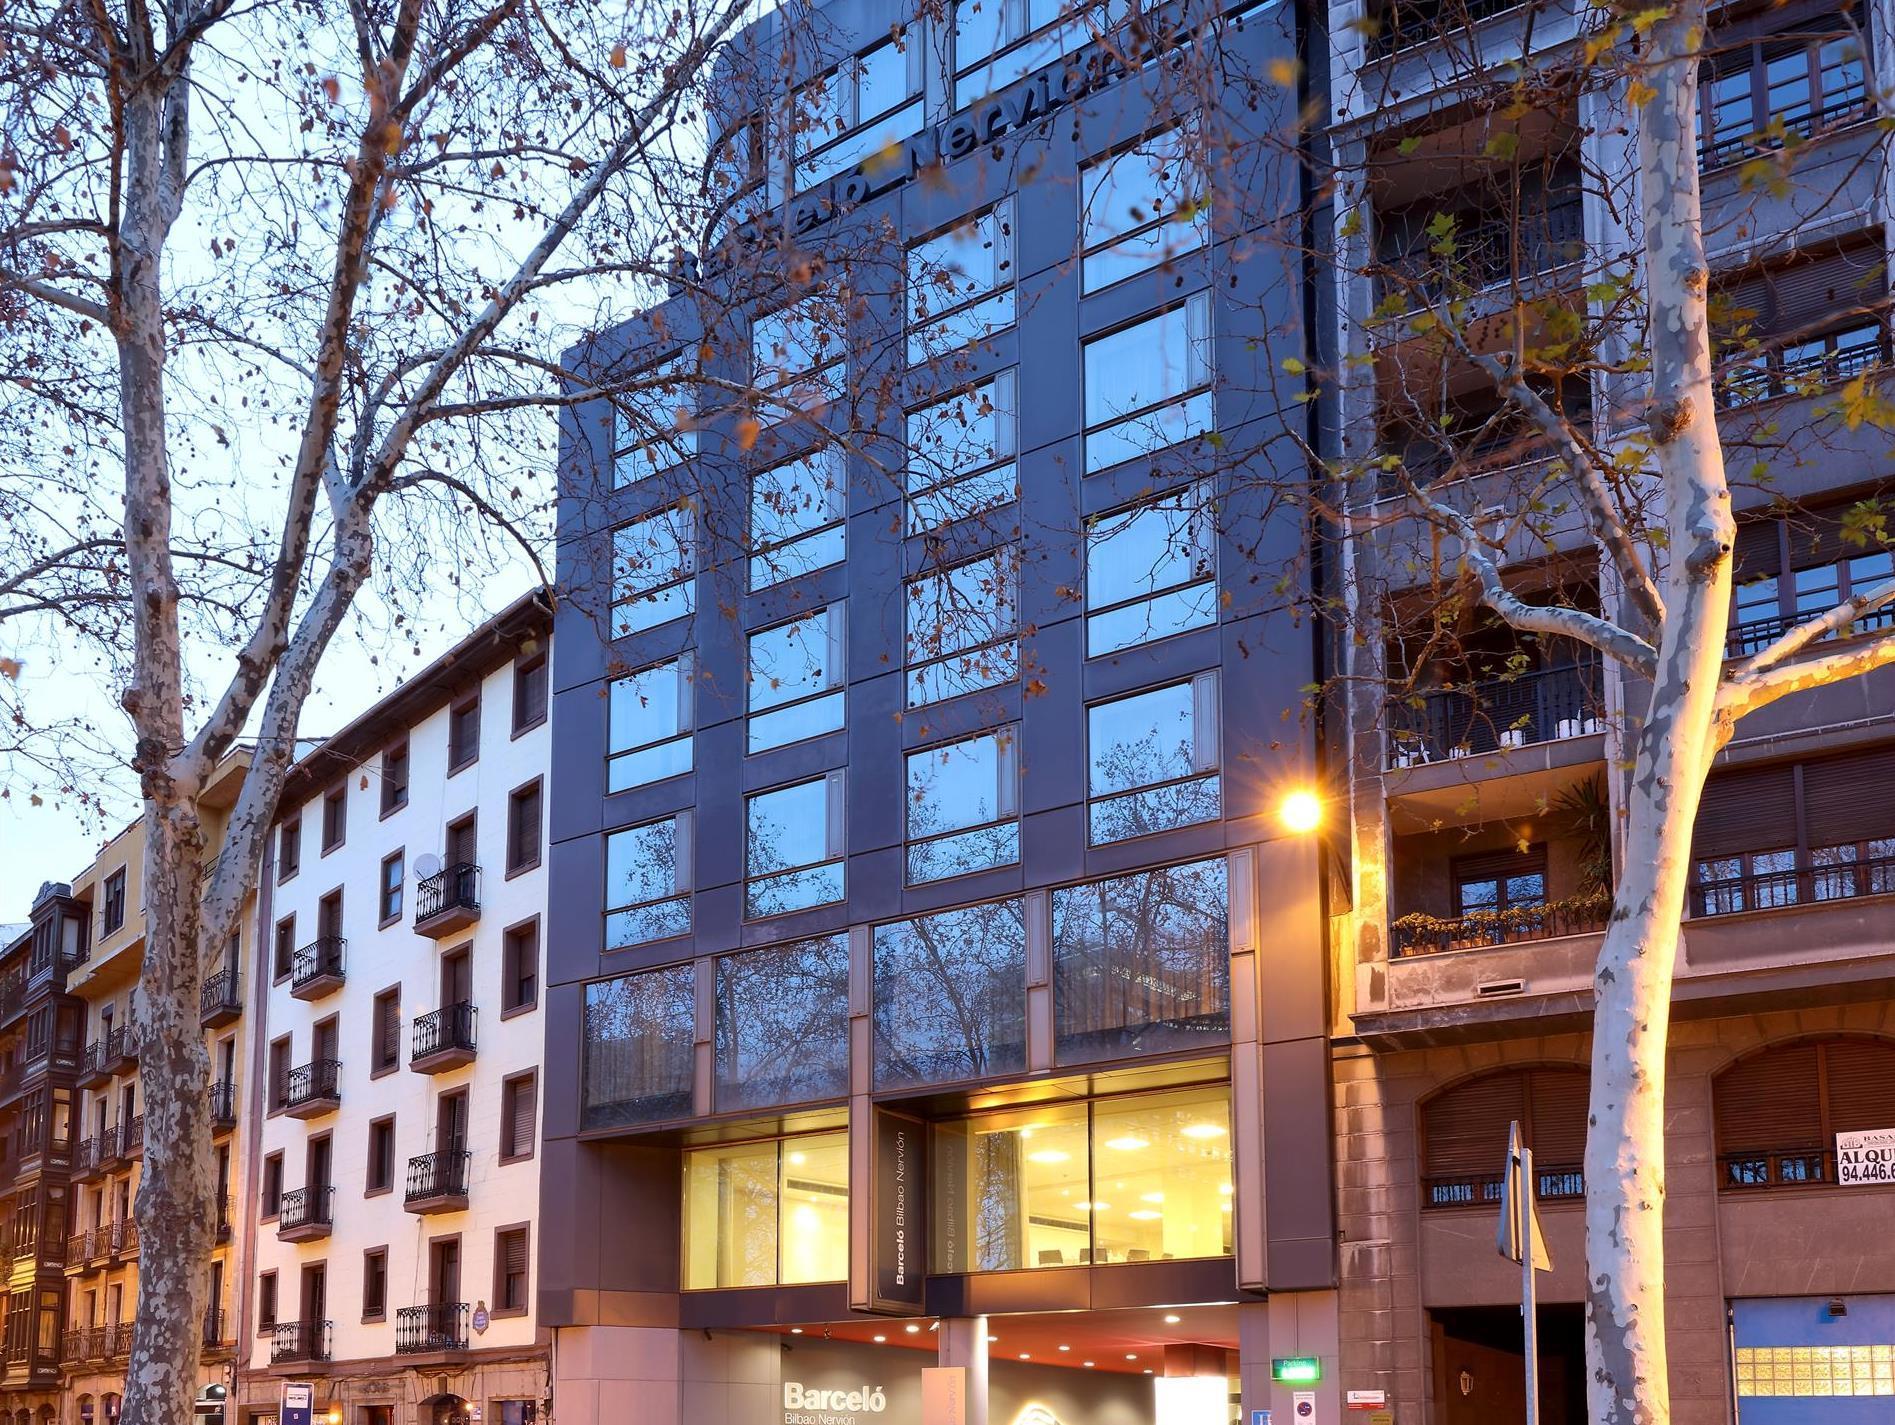 Barcelo Bilbao Nervion Hotel